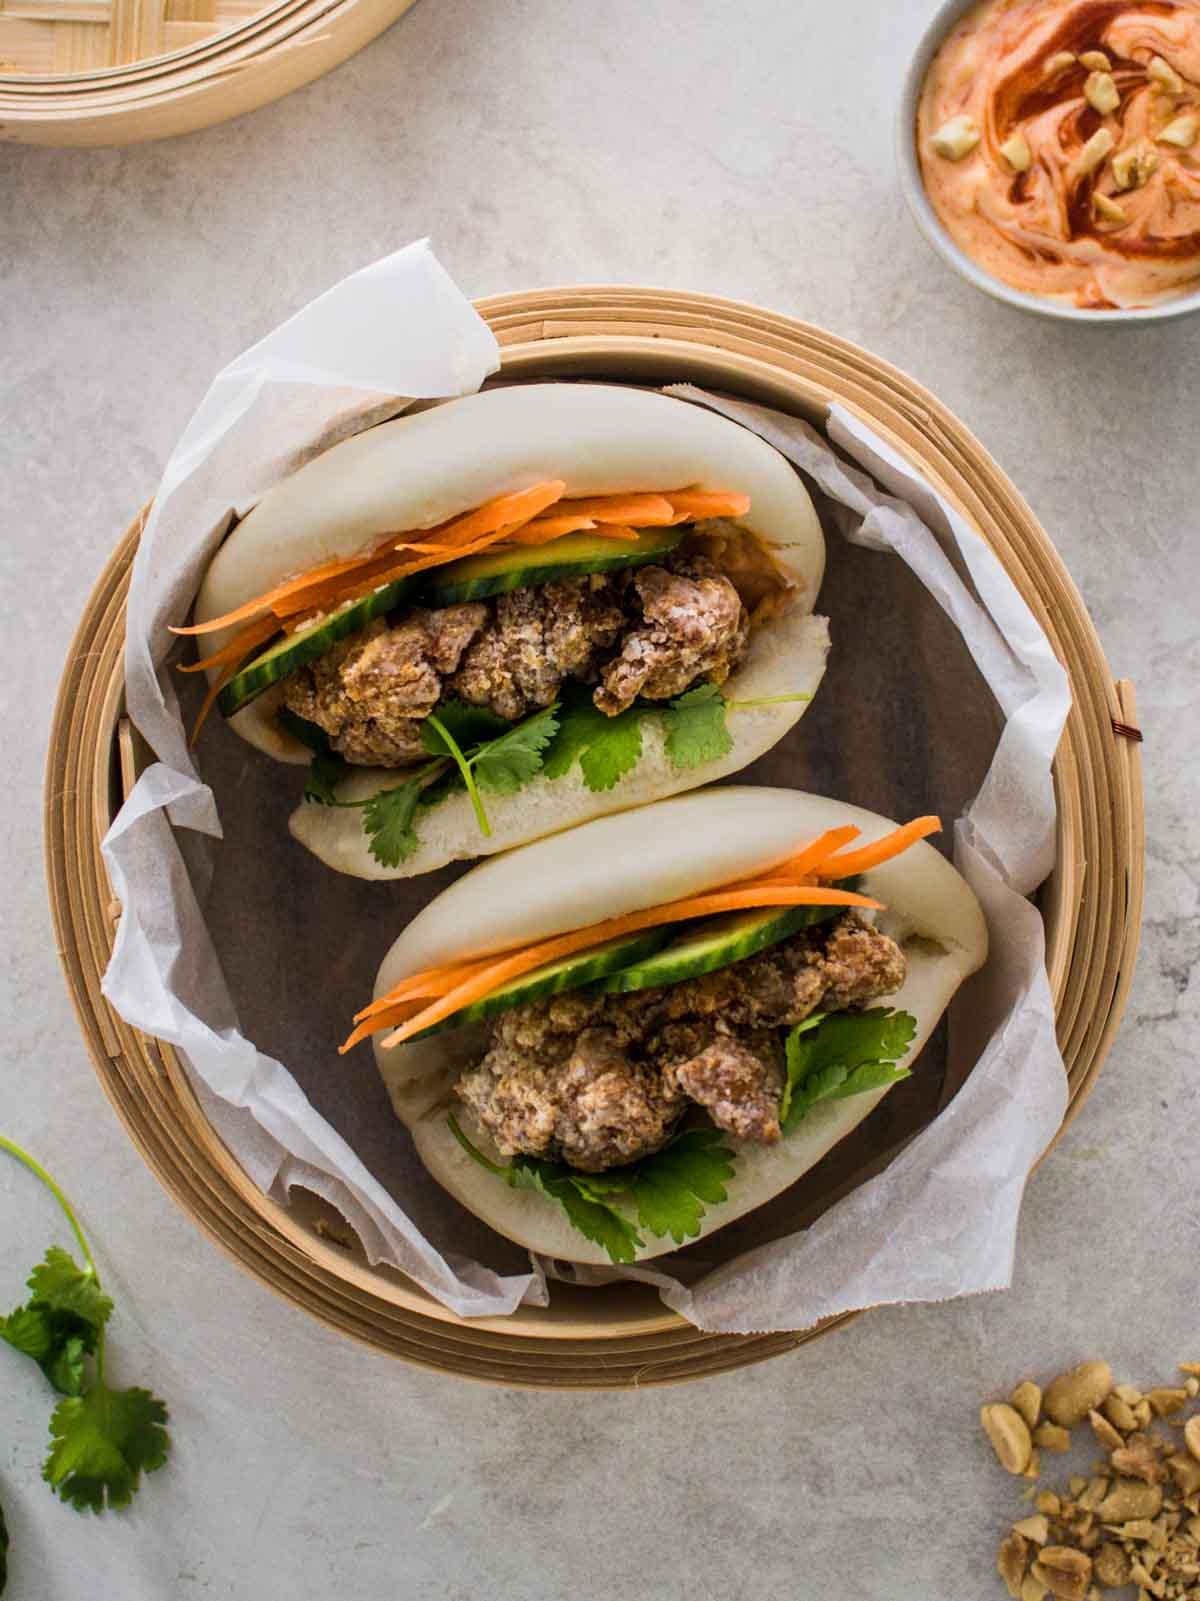 How to Make Fried Chicken Bao Buns